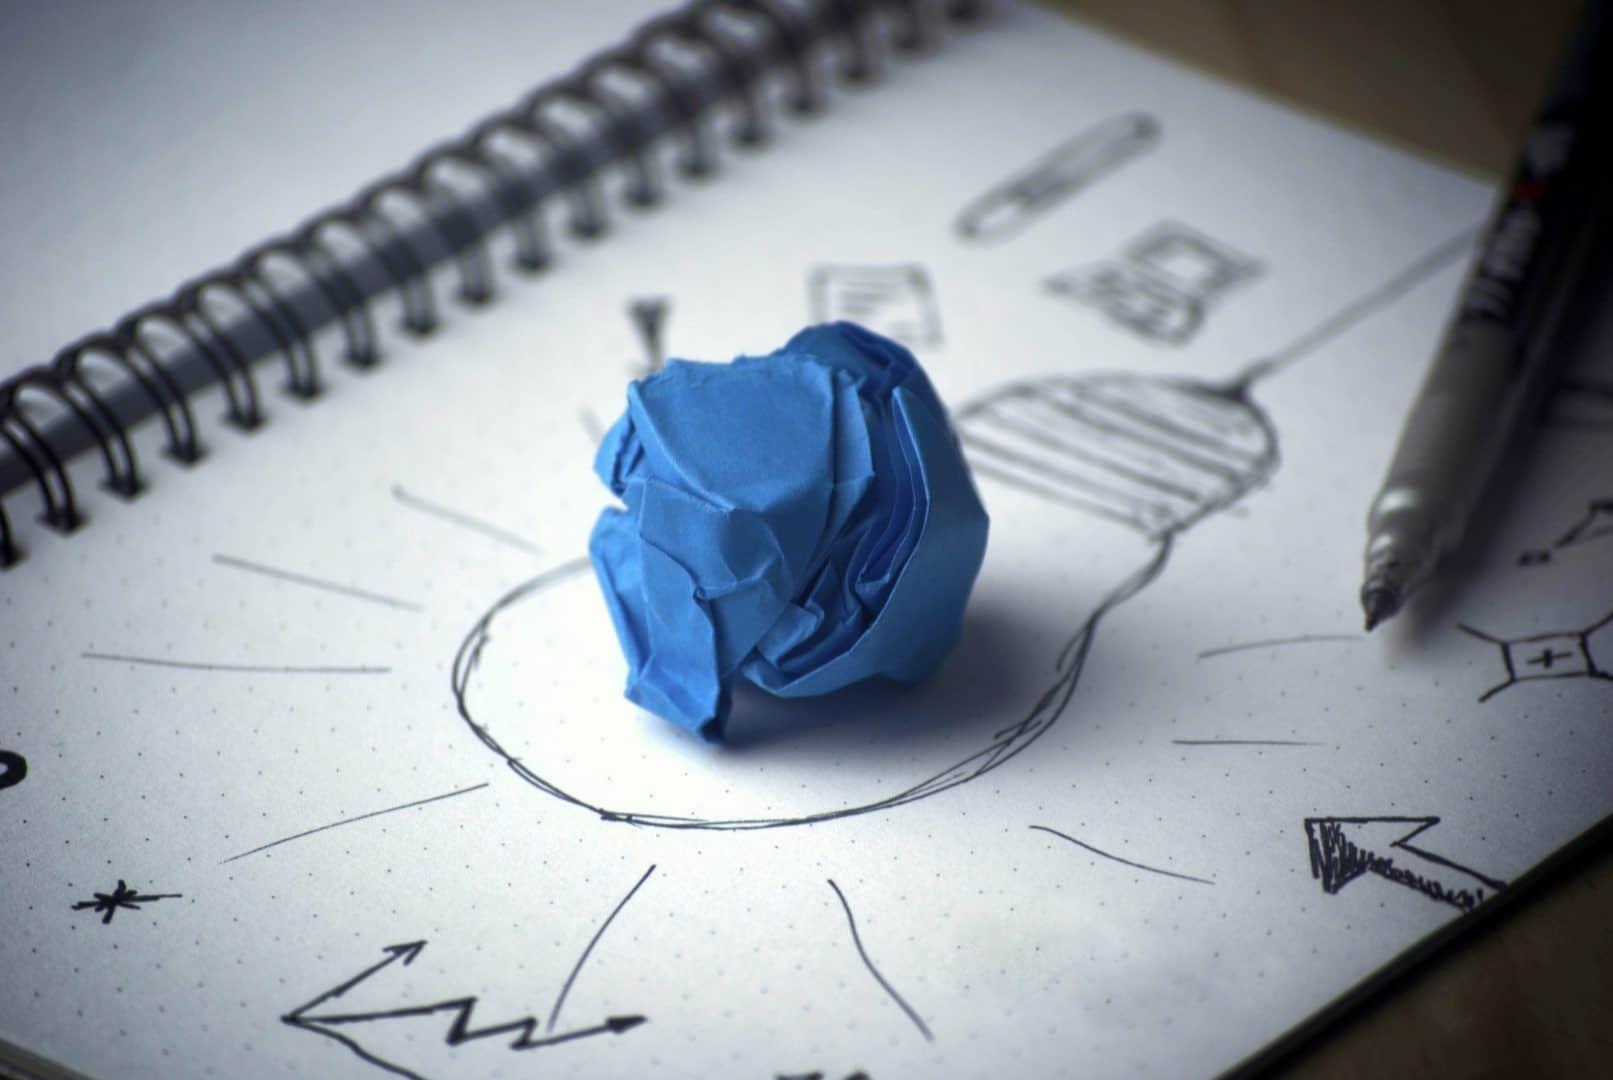 vender una idea